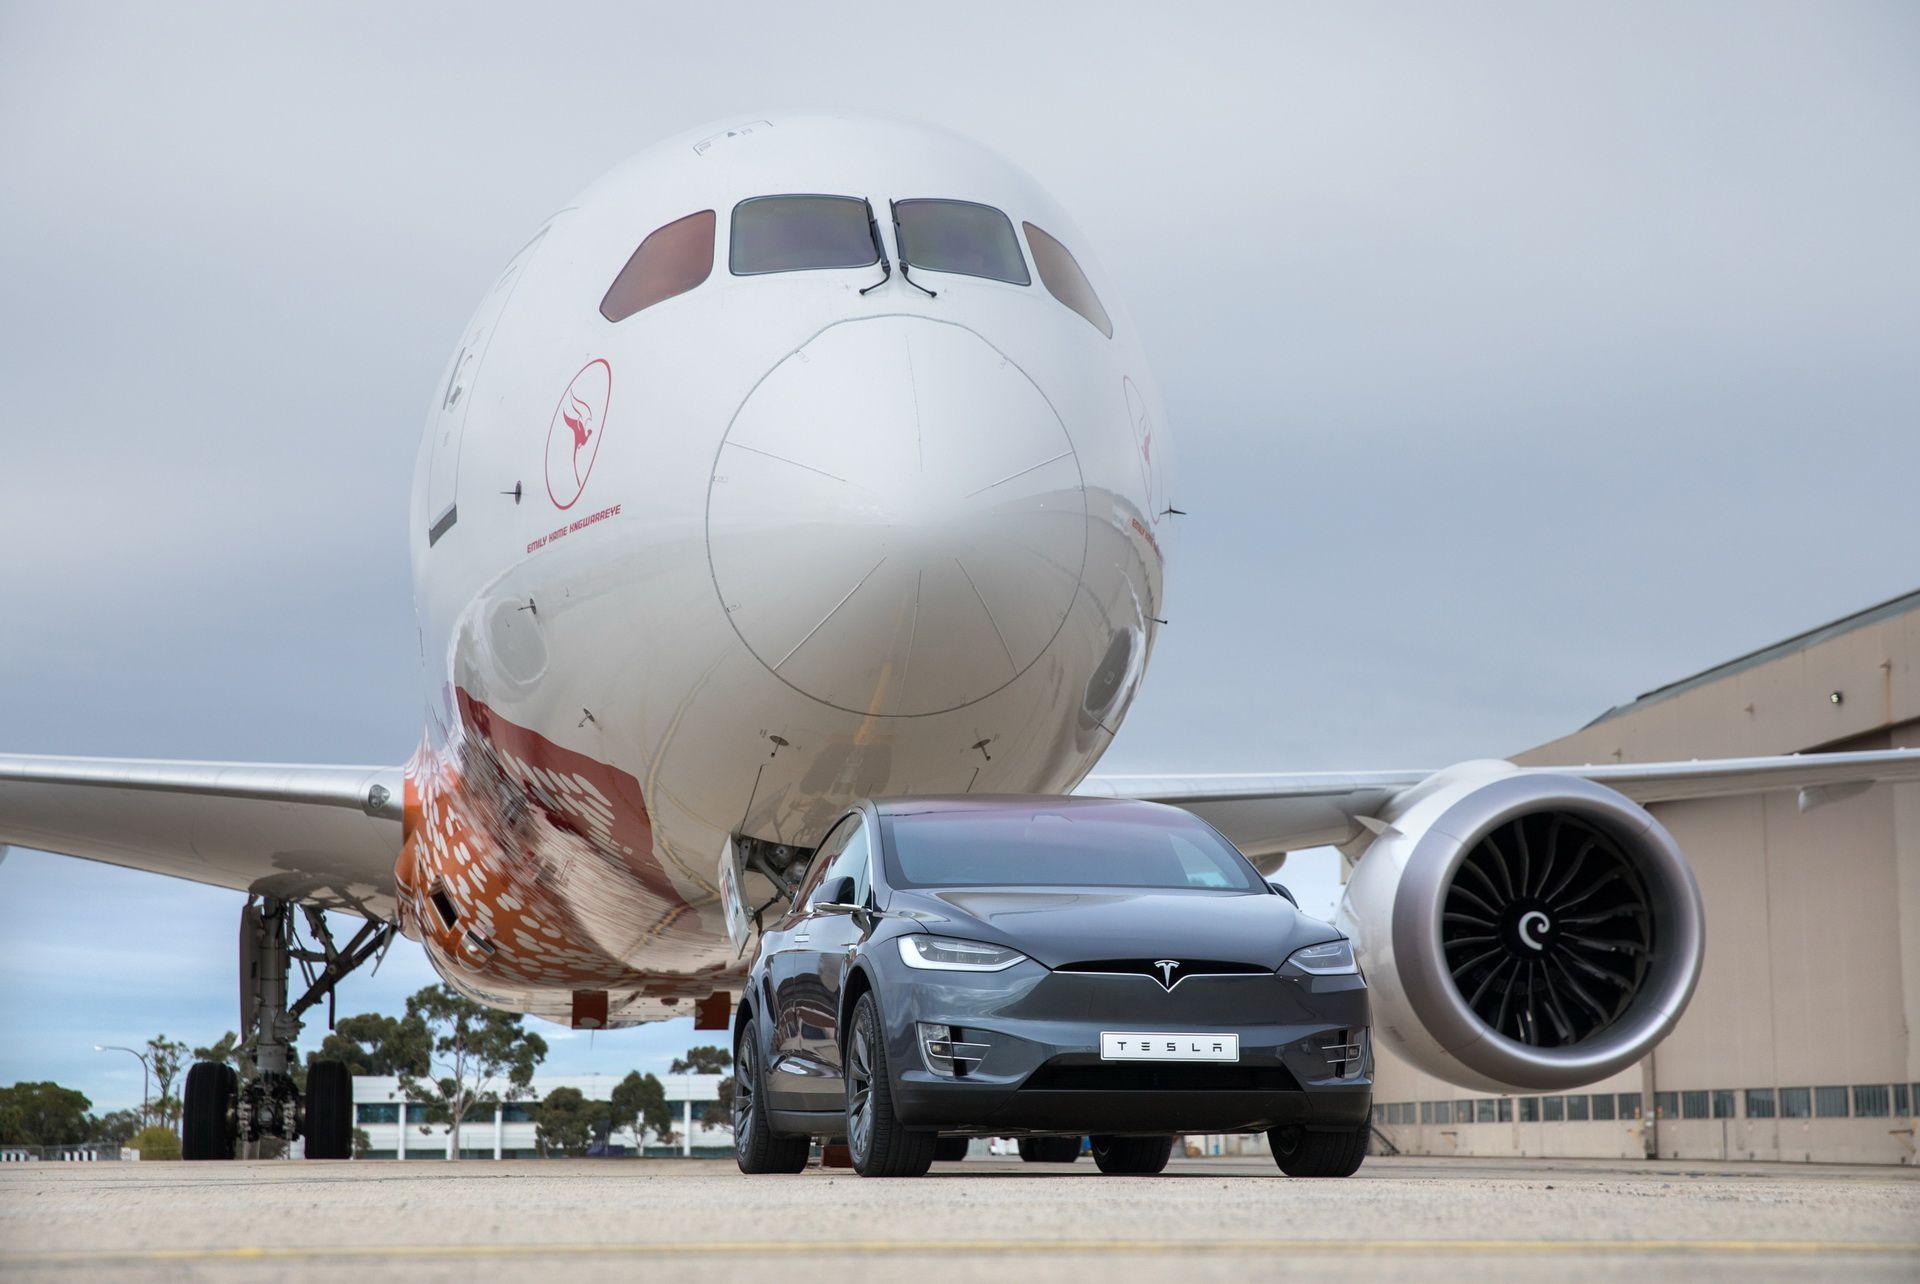 qantas-boeing-787-9-tesla-model-x-8